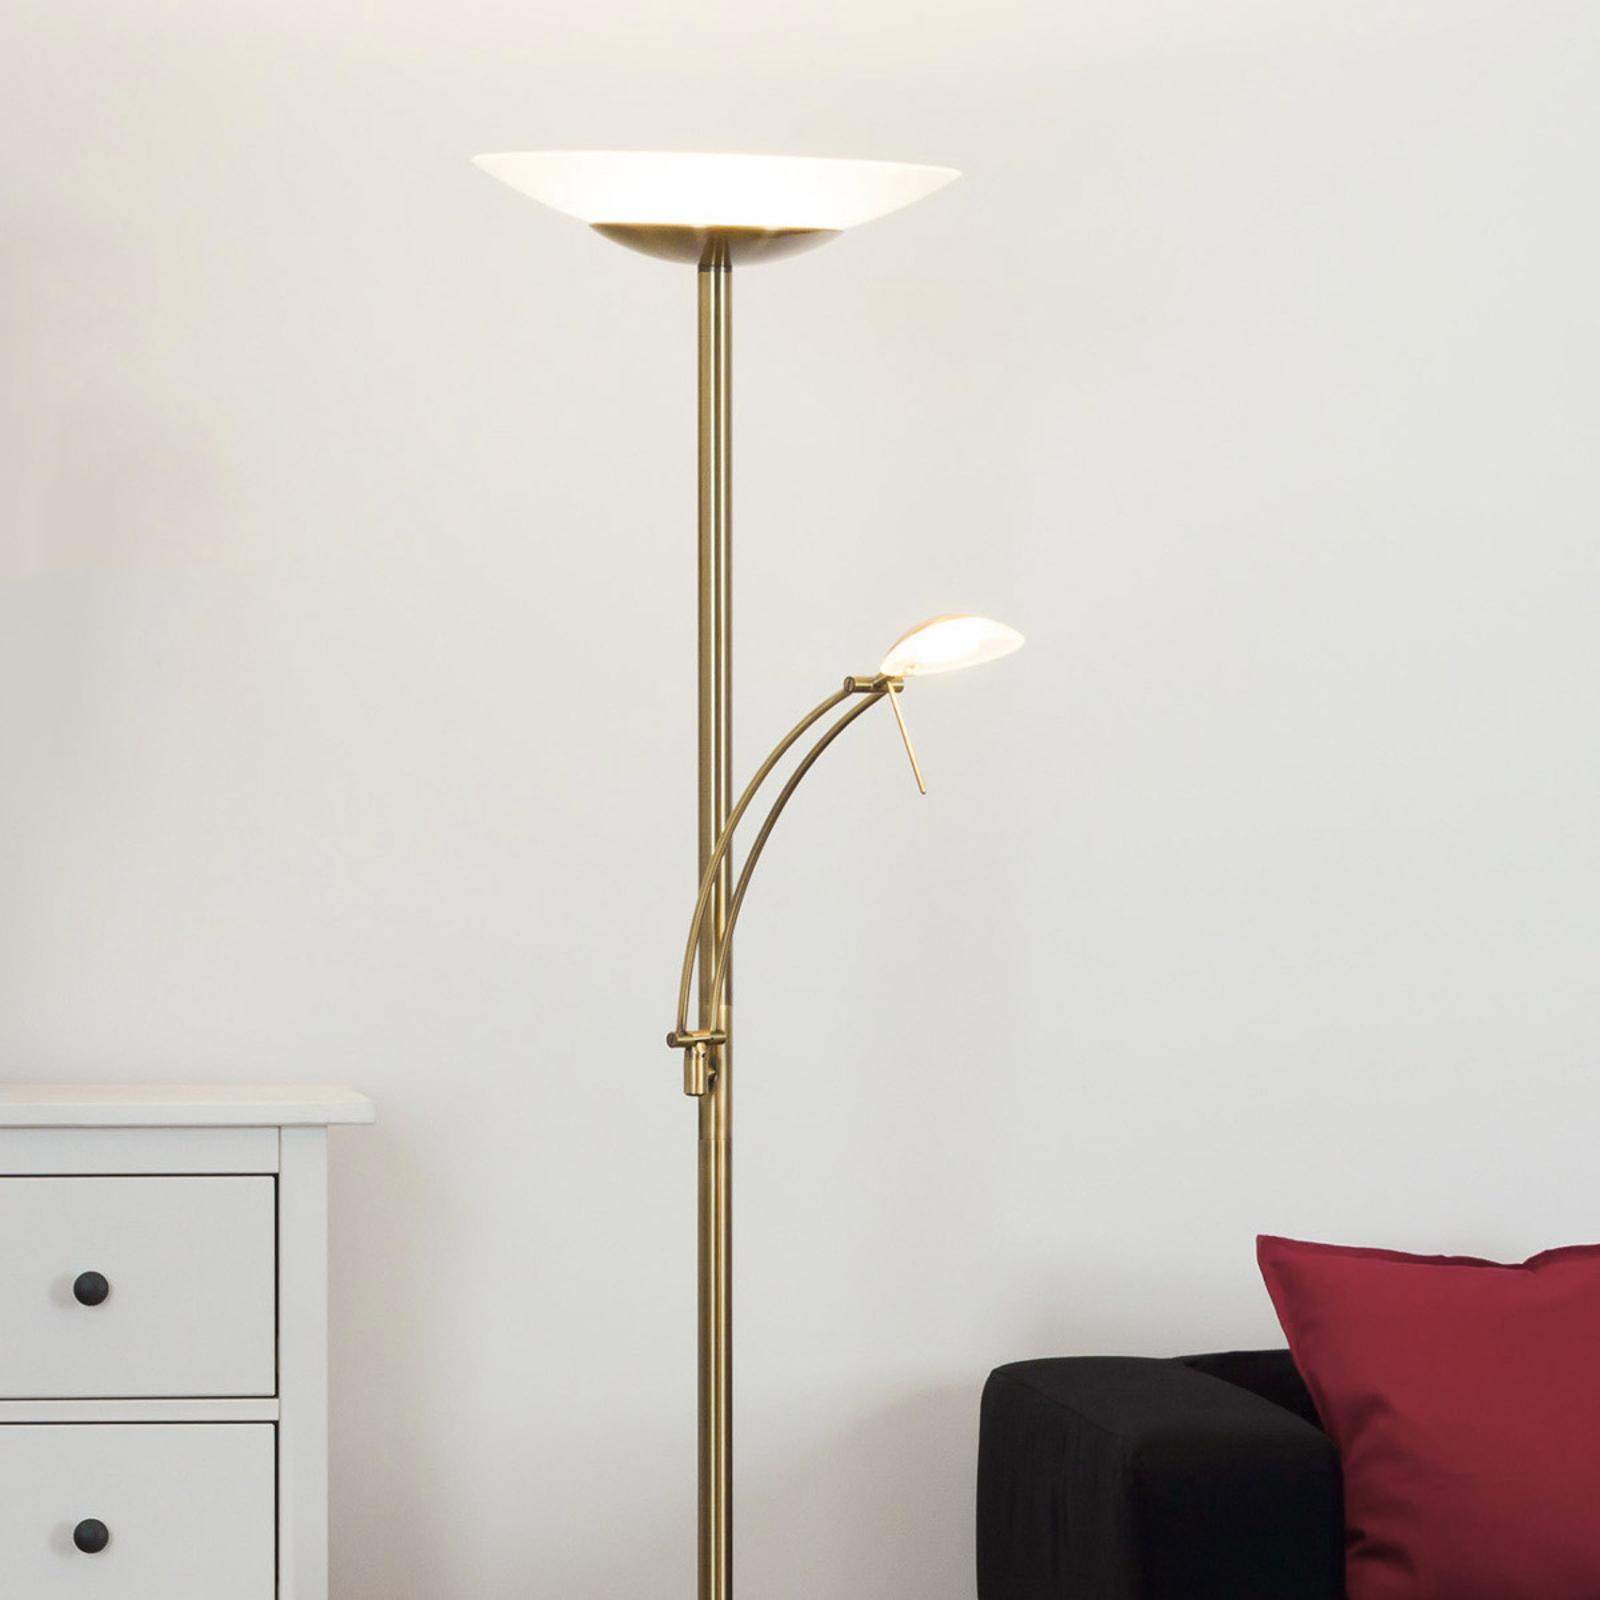 Altmessingfarbene LED-Stehleuchte Ilinca, dimmbar